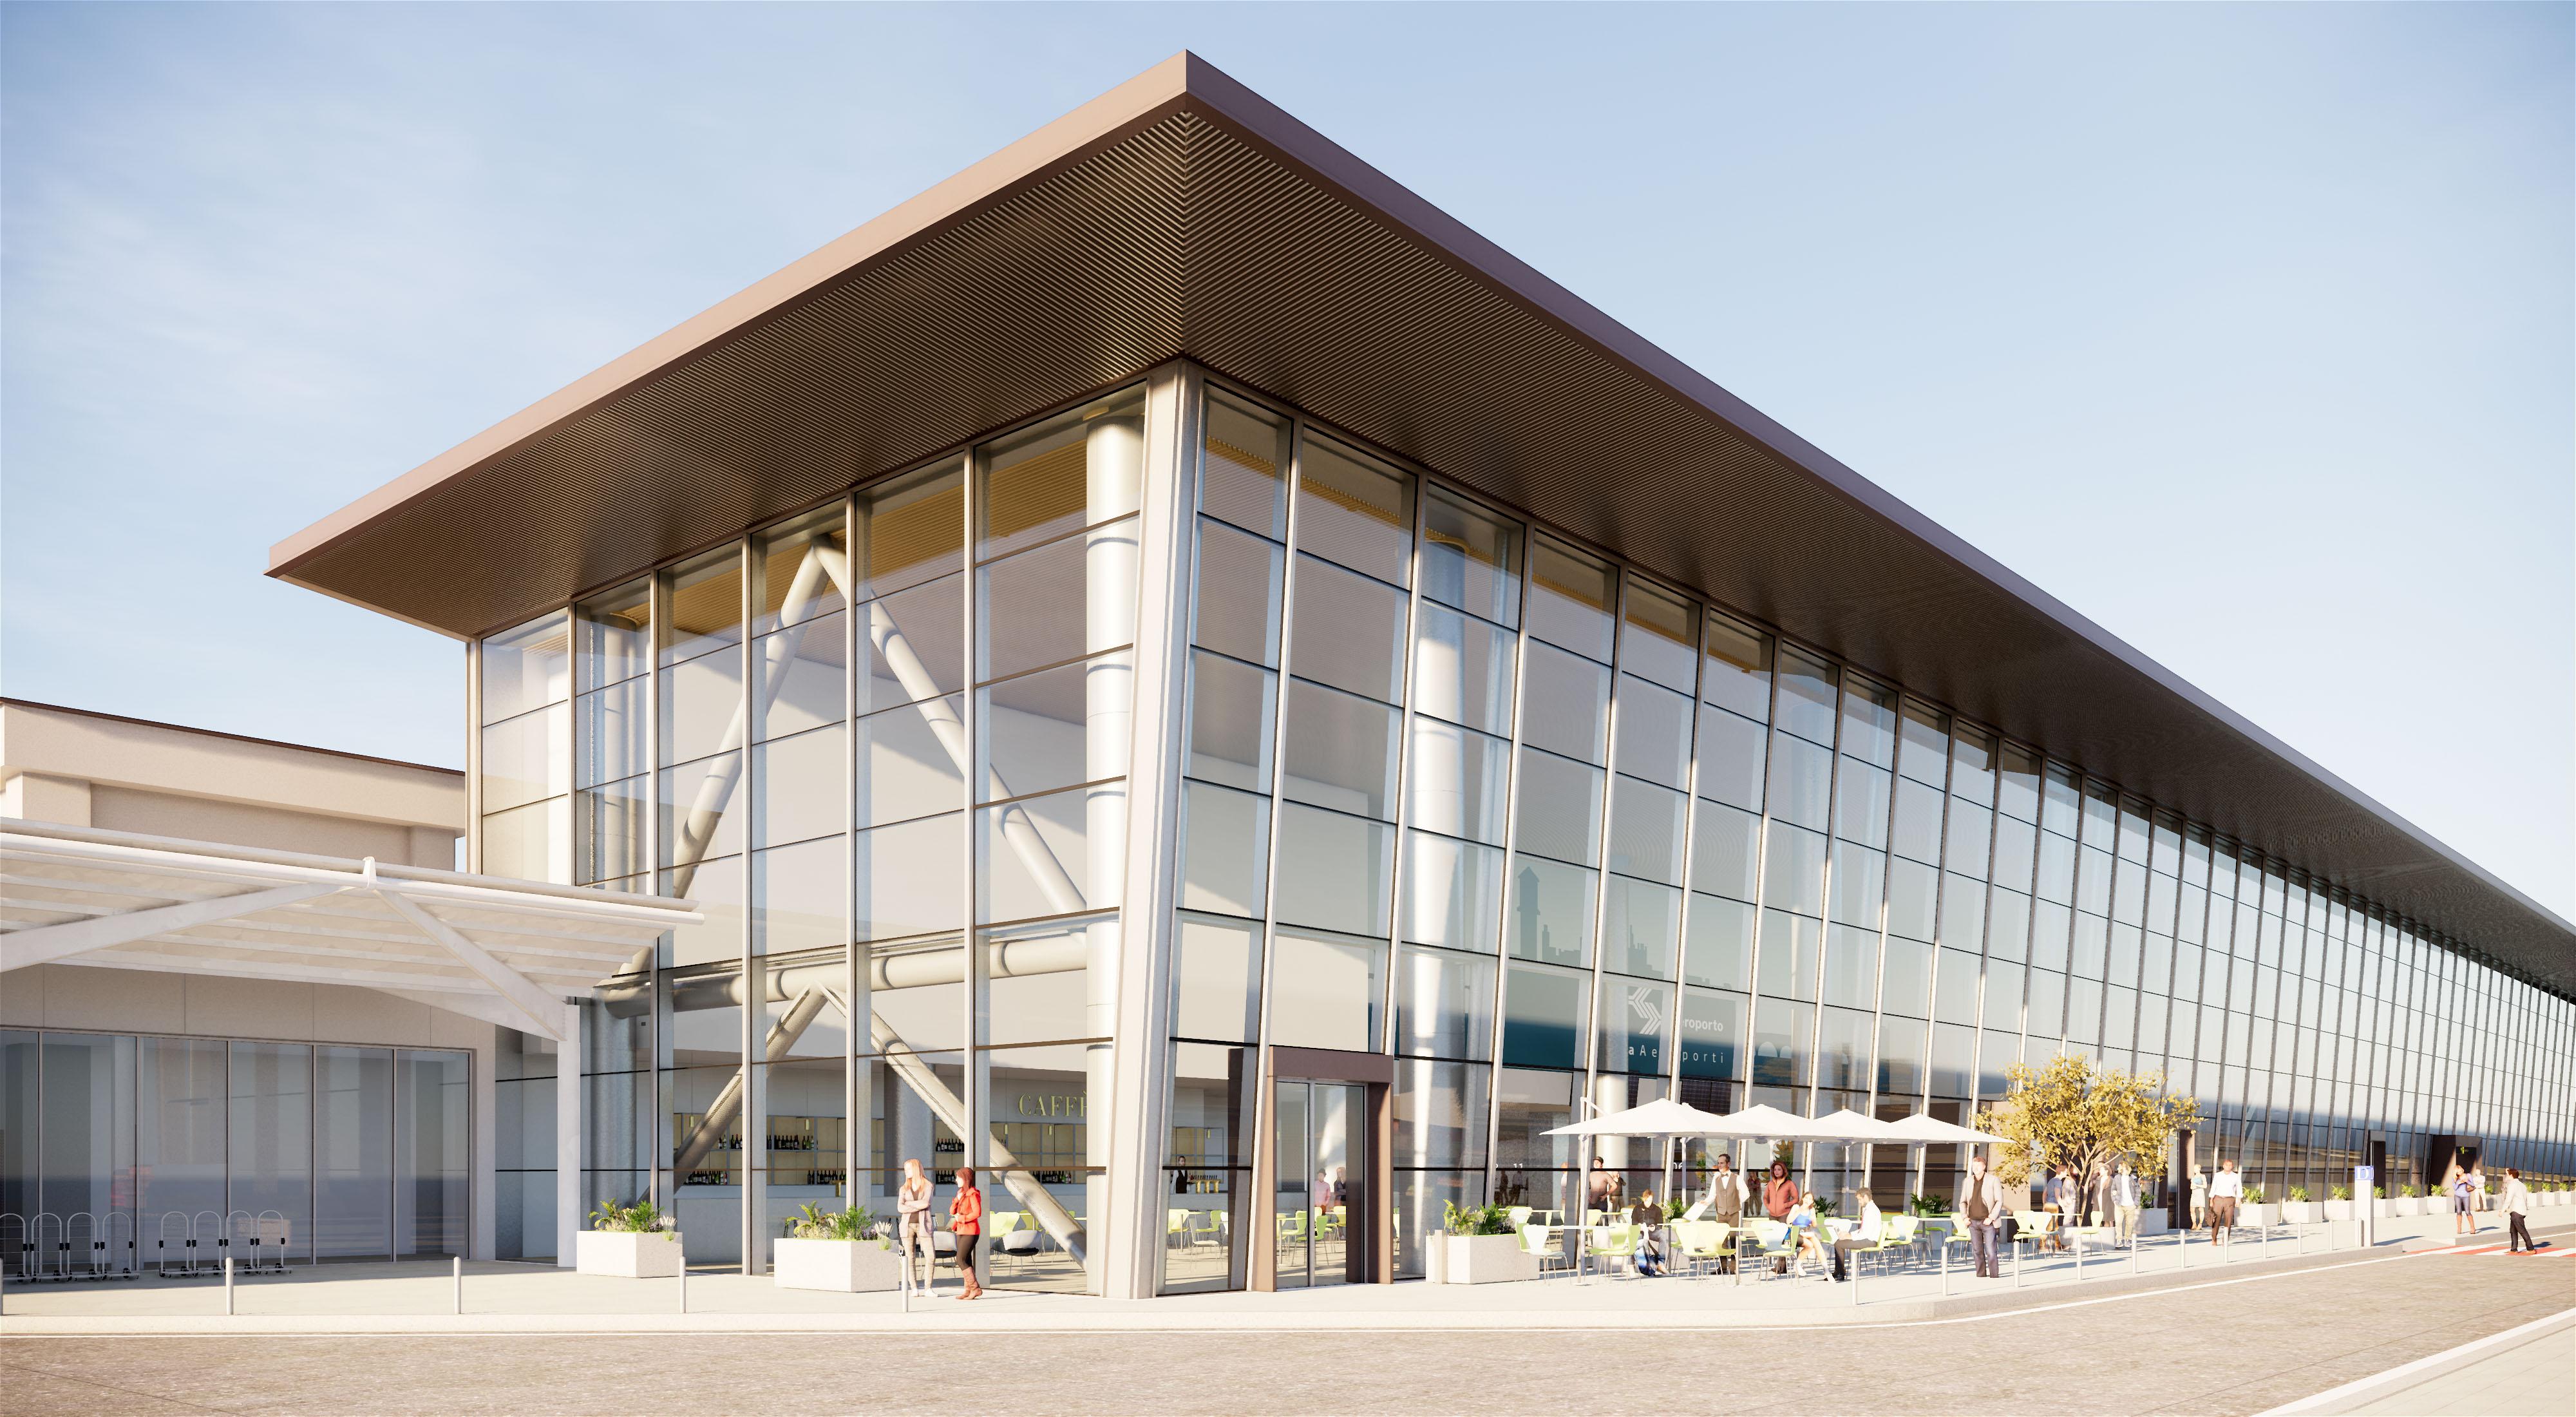 catullo airport